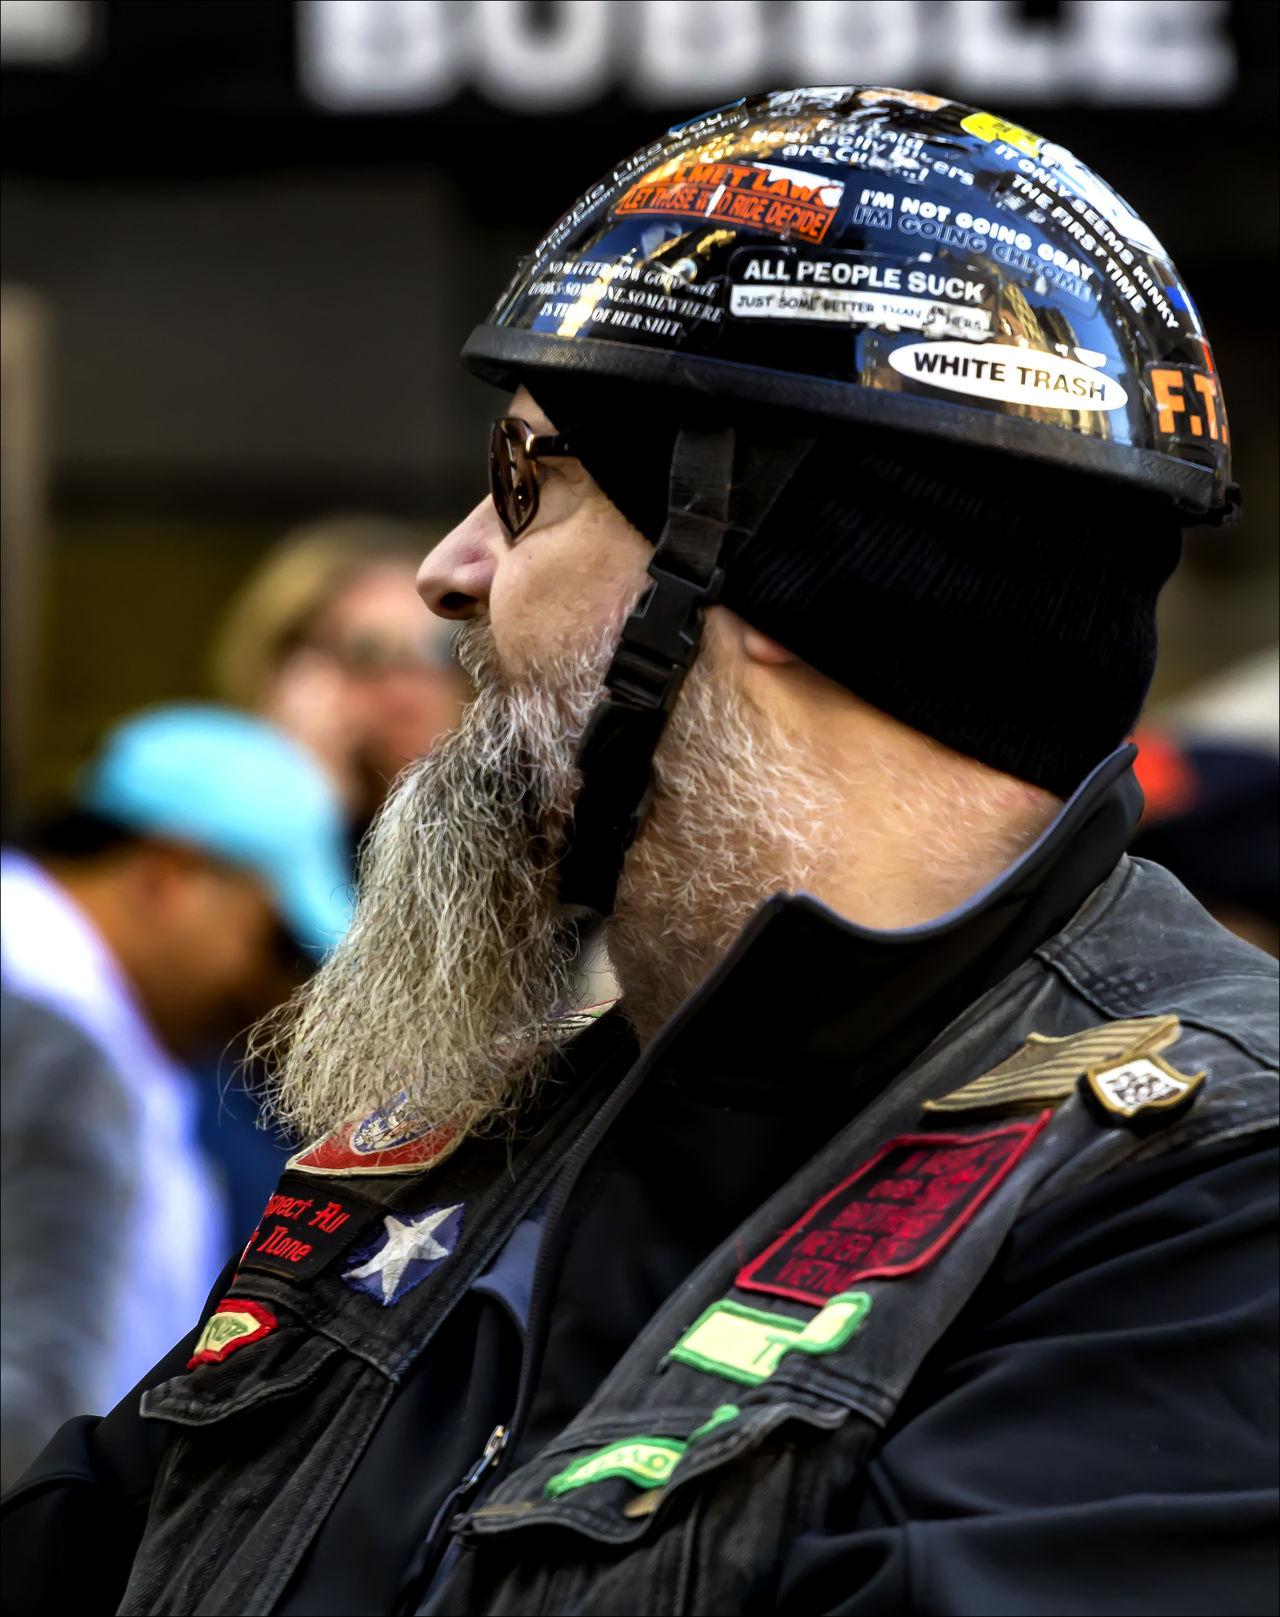 Veterans Day Parade NYC 2016 Veterans Veterans Day Parade Nyc 11_11_16 Vietnam Veterans Vietnam Veterans Motorcycle Club